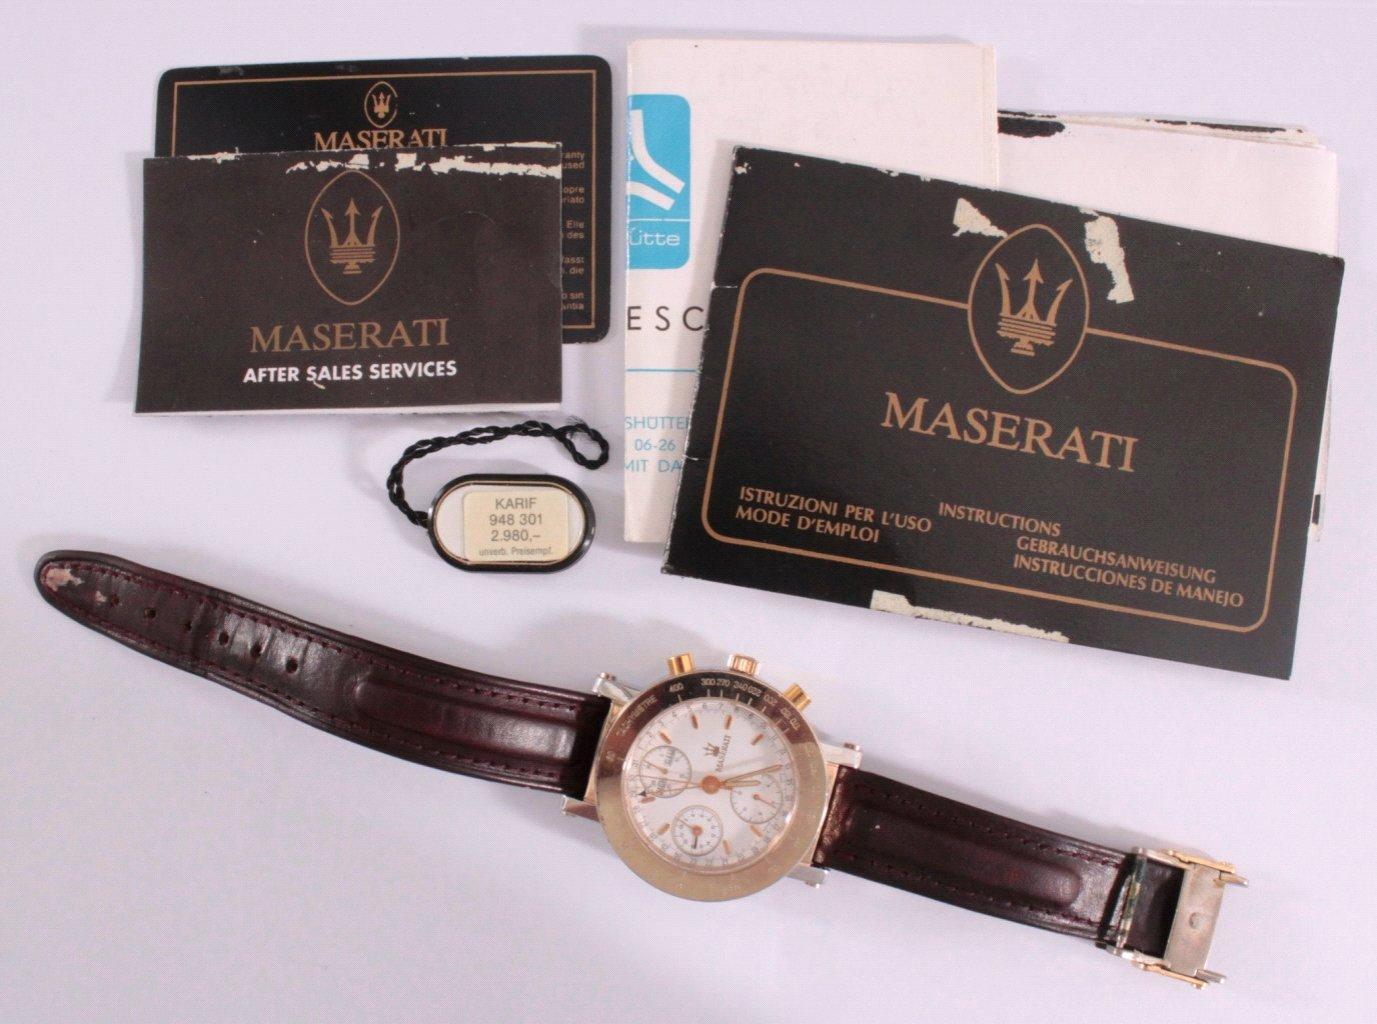 Armbanduhr Maserati Official Timepiece, Modell Karif-5